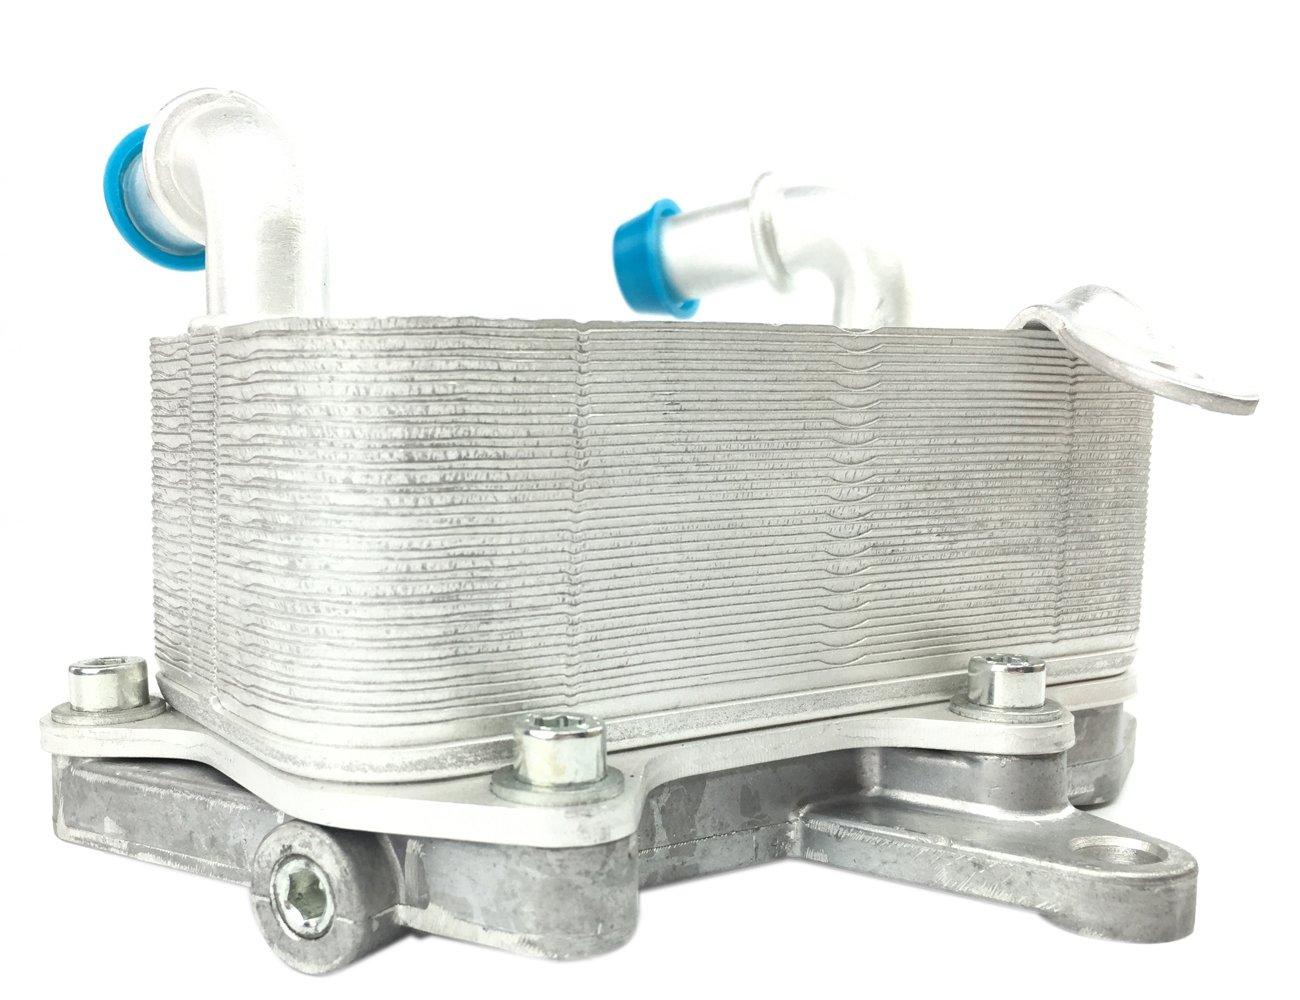 TOPAZ 3C0317037A Auto Transmission Oil Cooler with Base for 08-12 Volkswagen Passat CC 2.0L